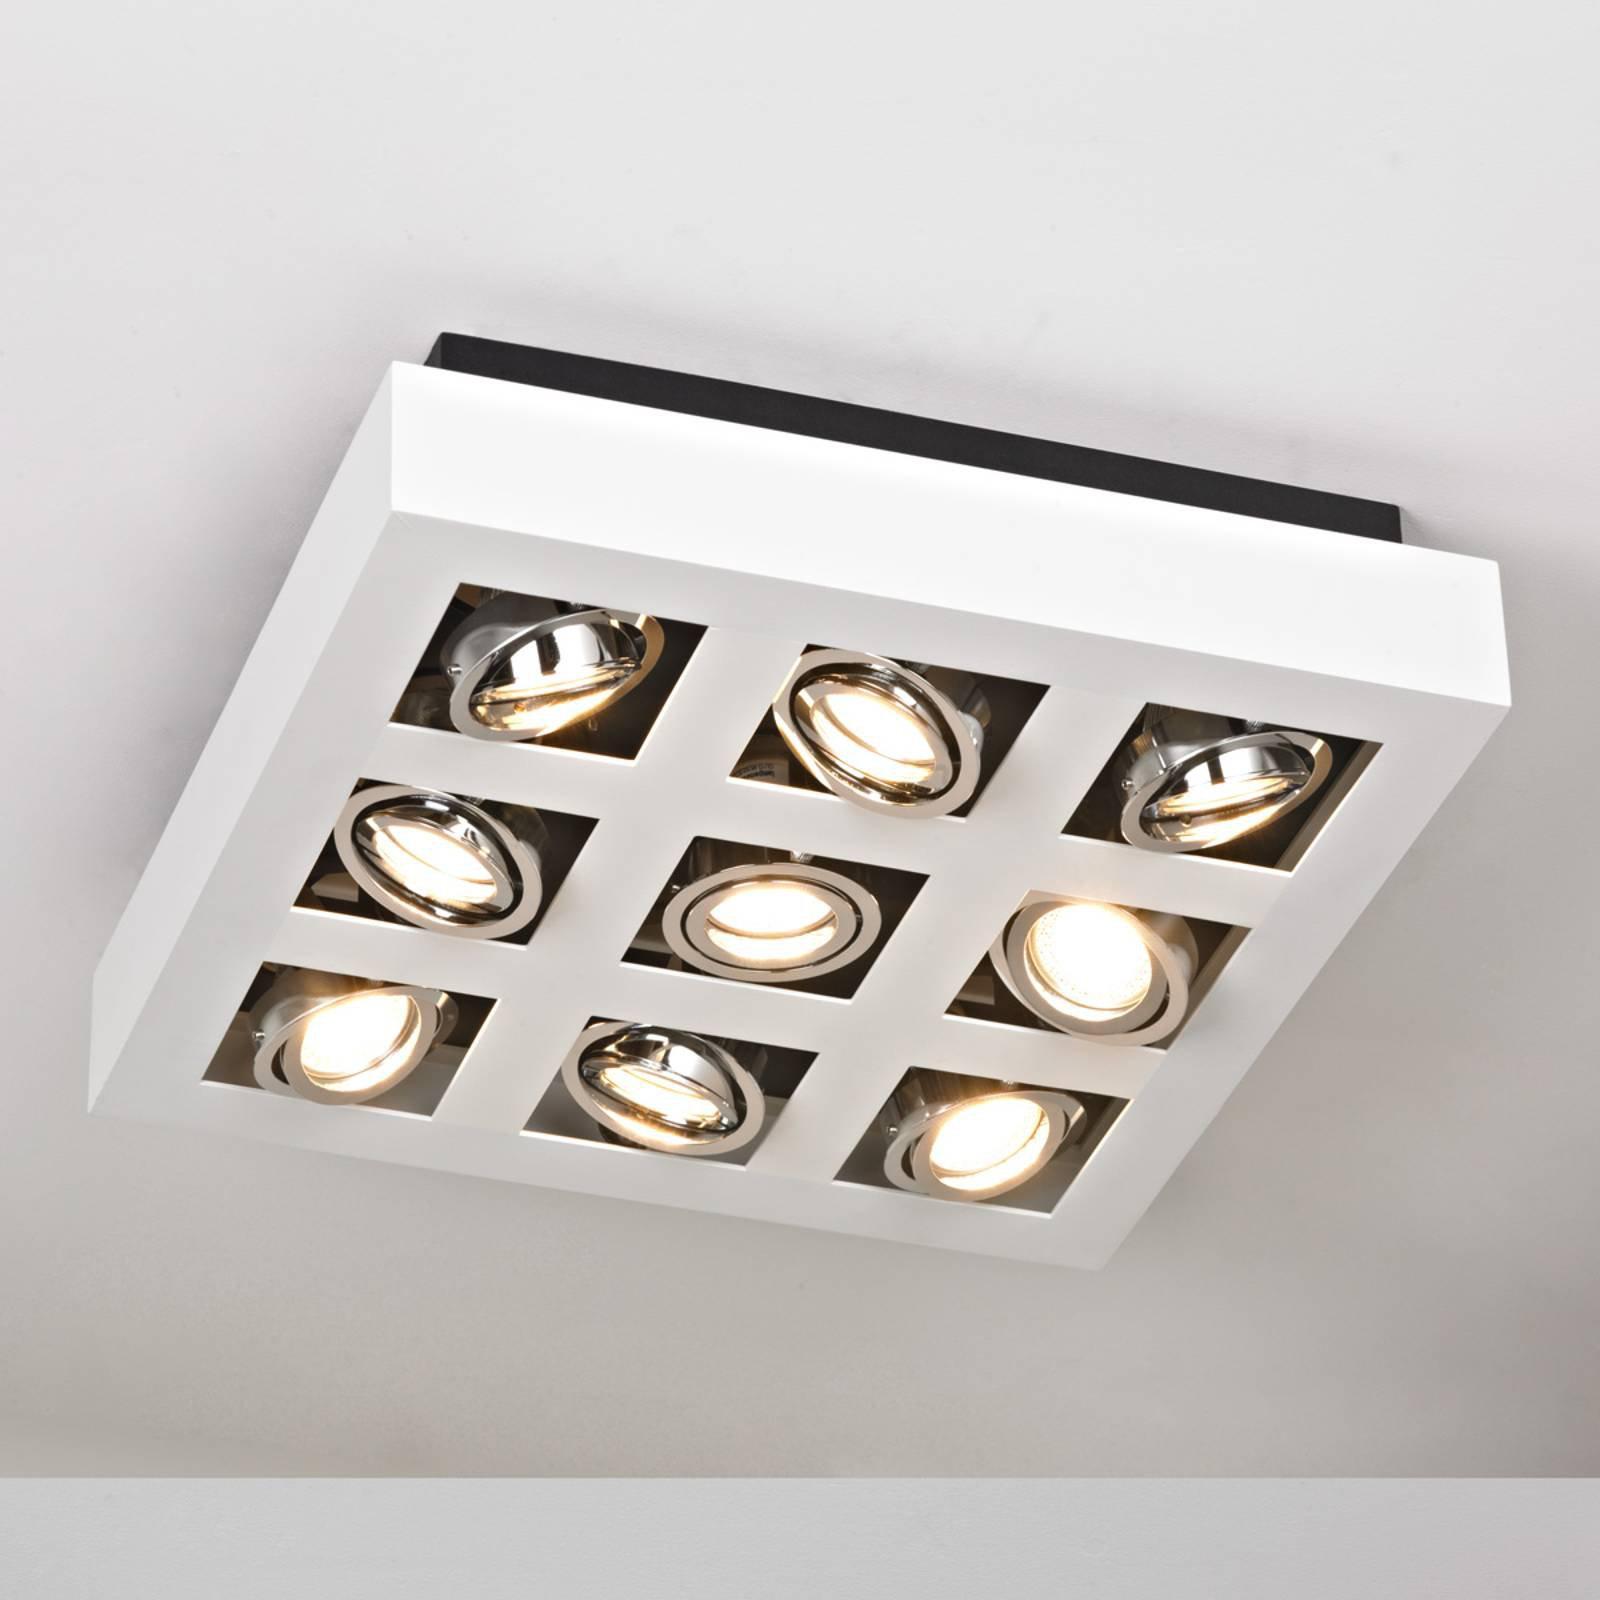 Klart lysende LED-taklampe Vince, 9 lys